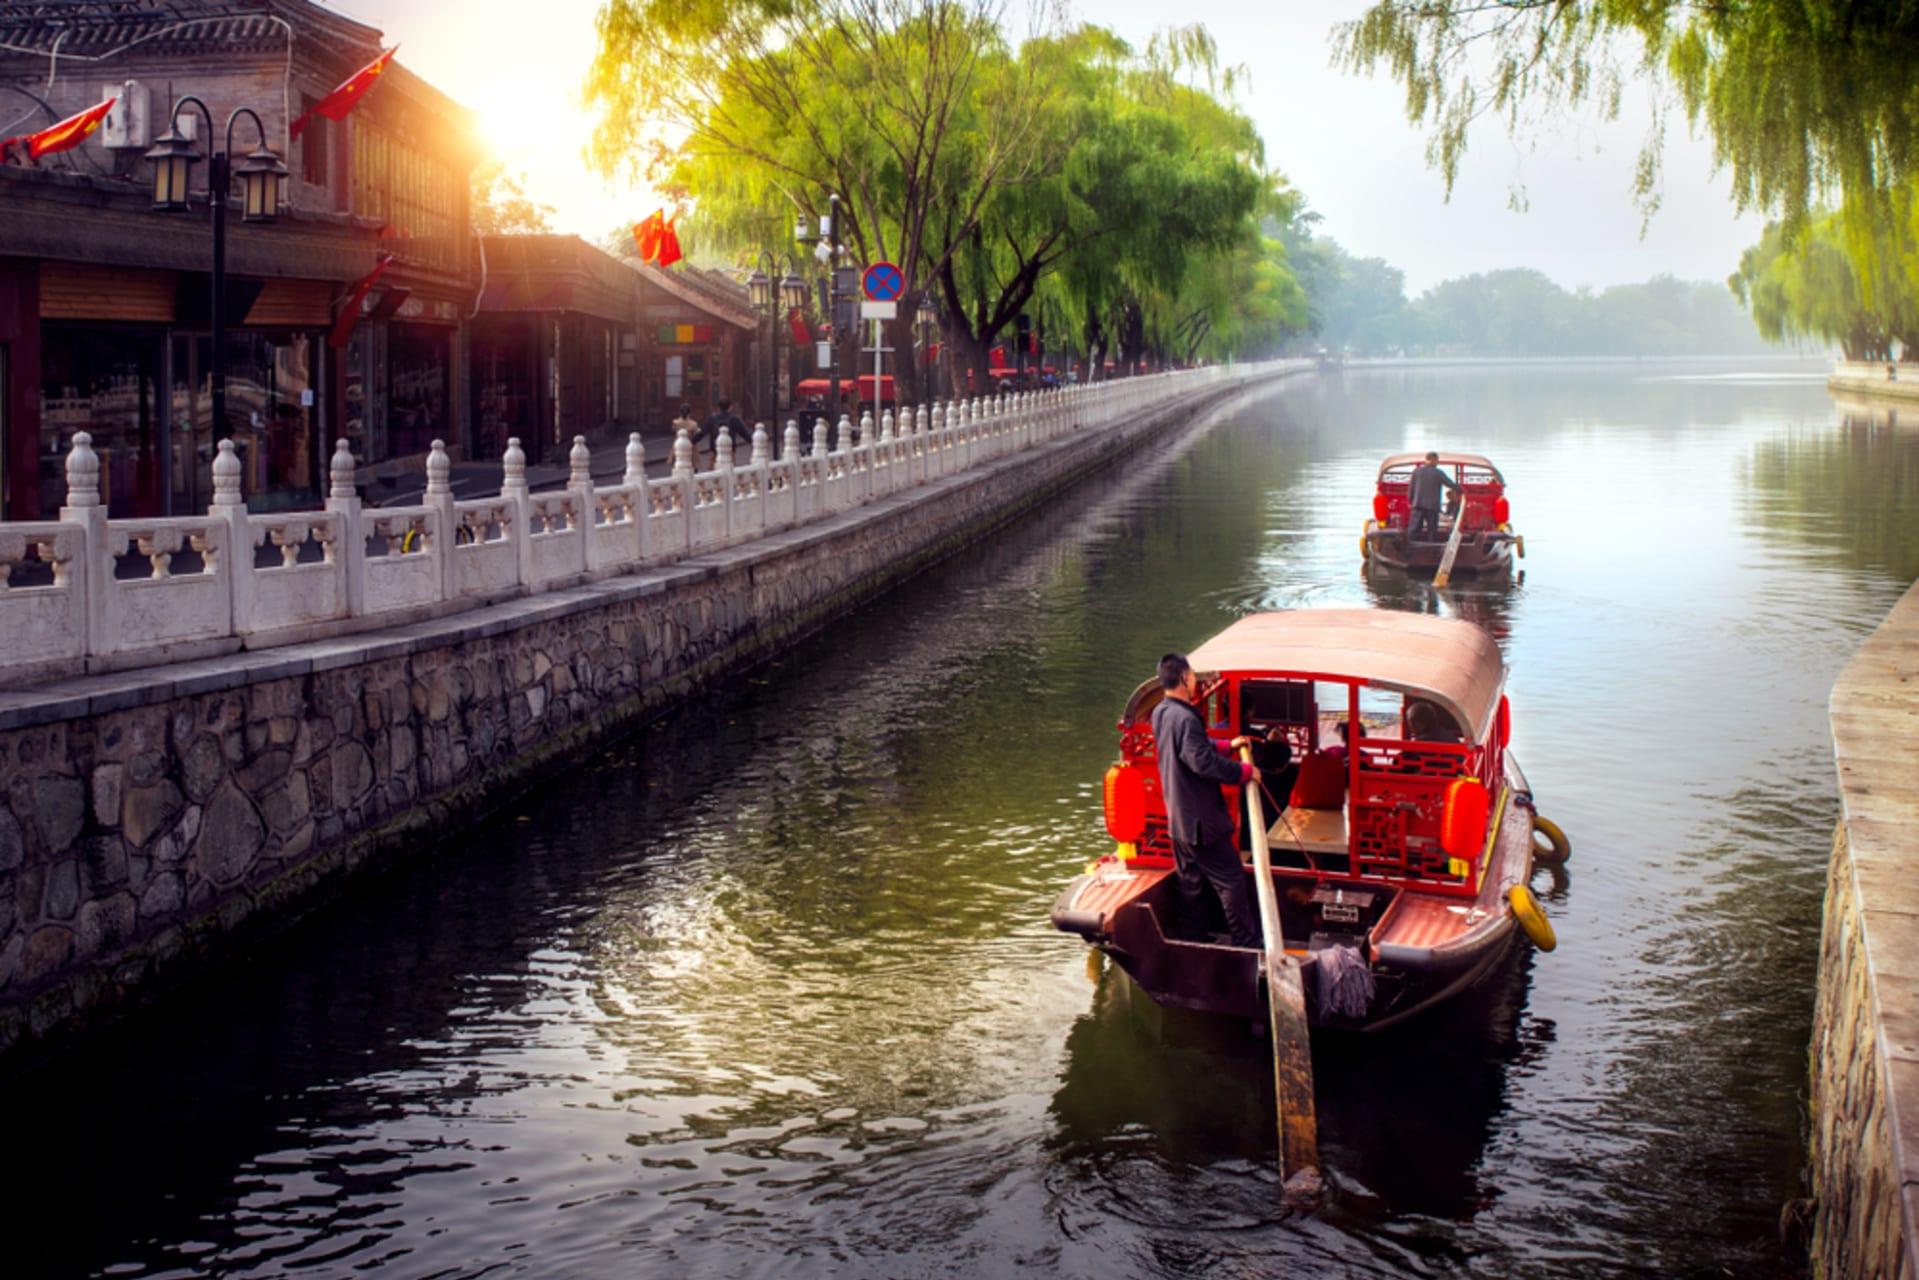 Beijing - Yandai Byway and ShiChaHai: A Vivid Beijinger's Life Area